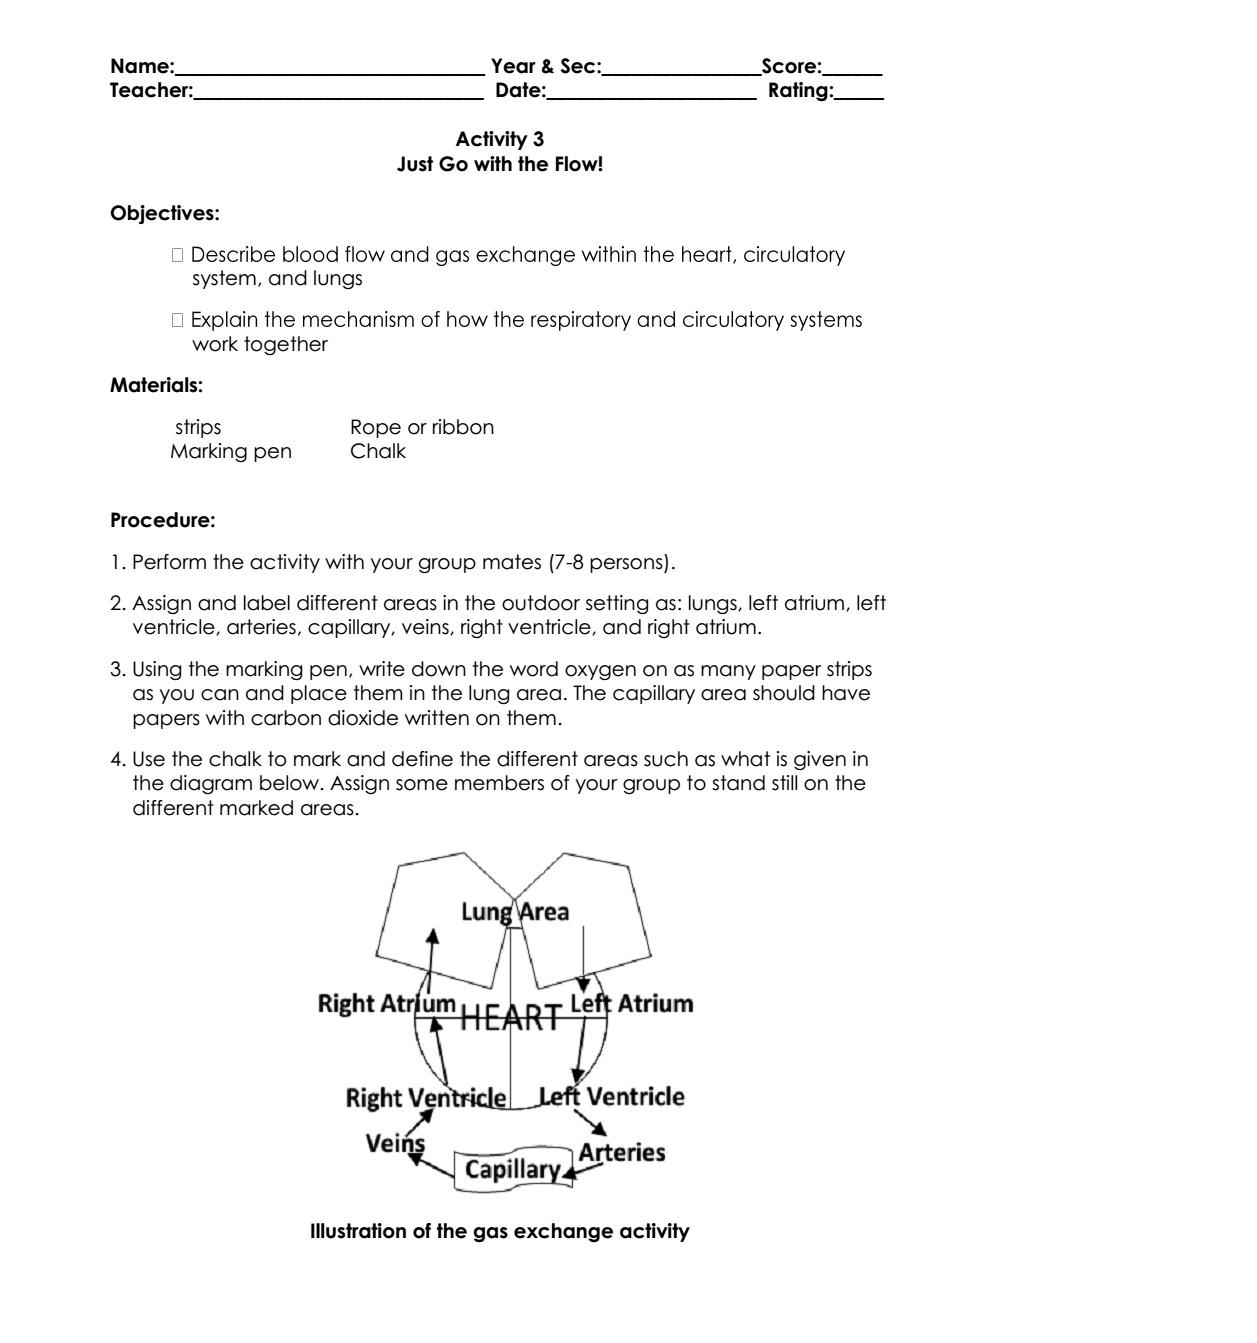 grade 11 physics exam multiple choice questions